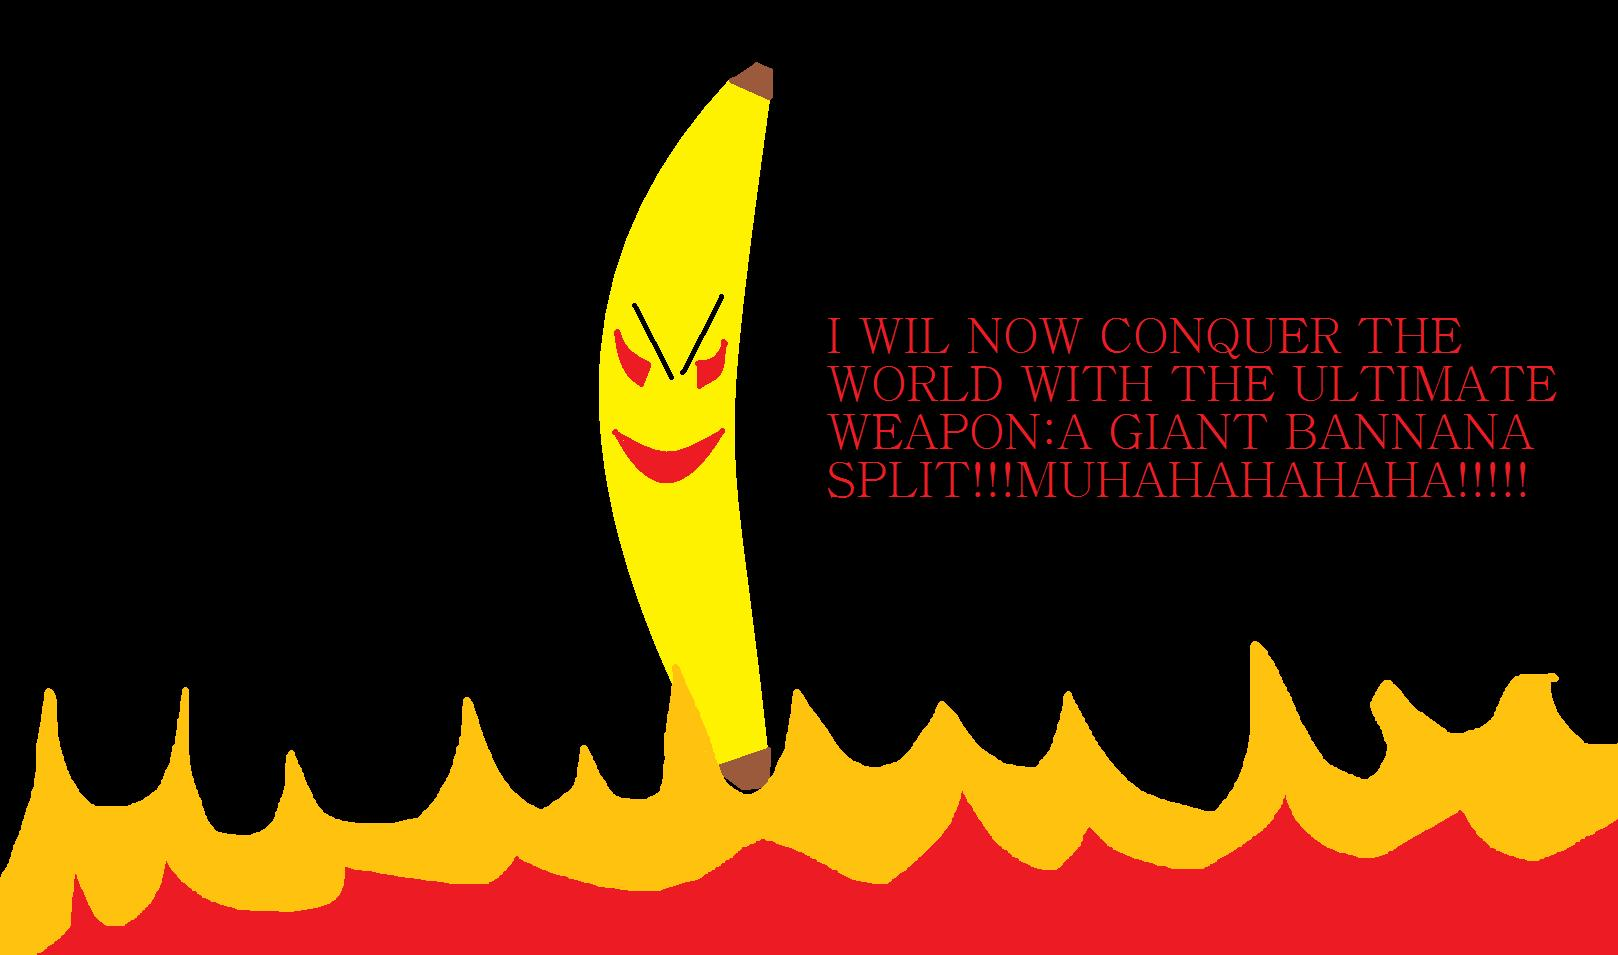 the evil banana